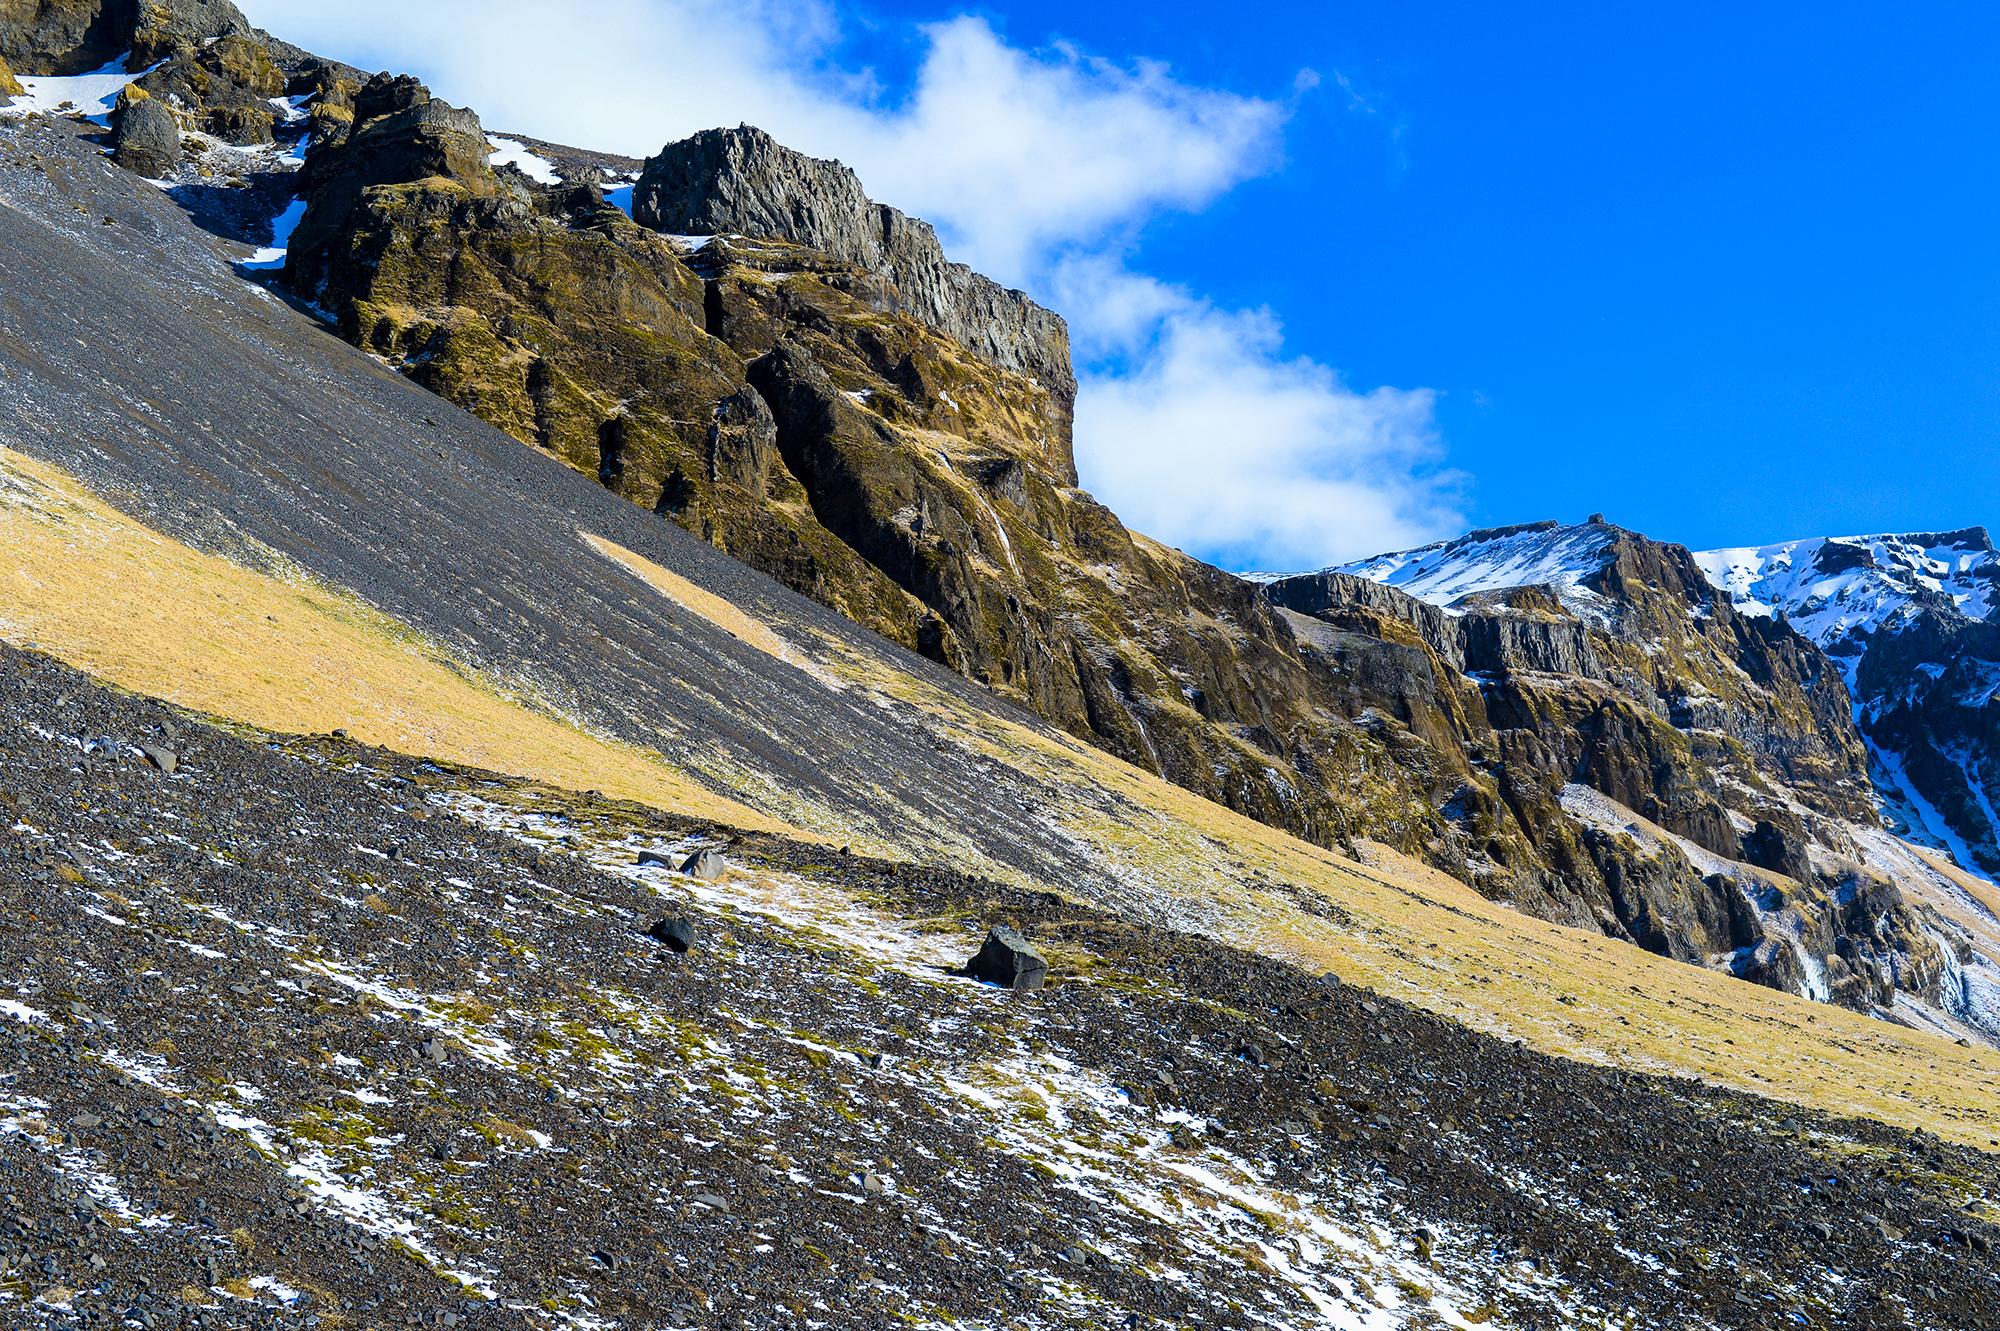 iceland_mountain.jpg